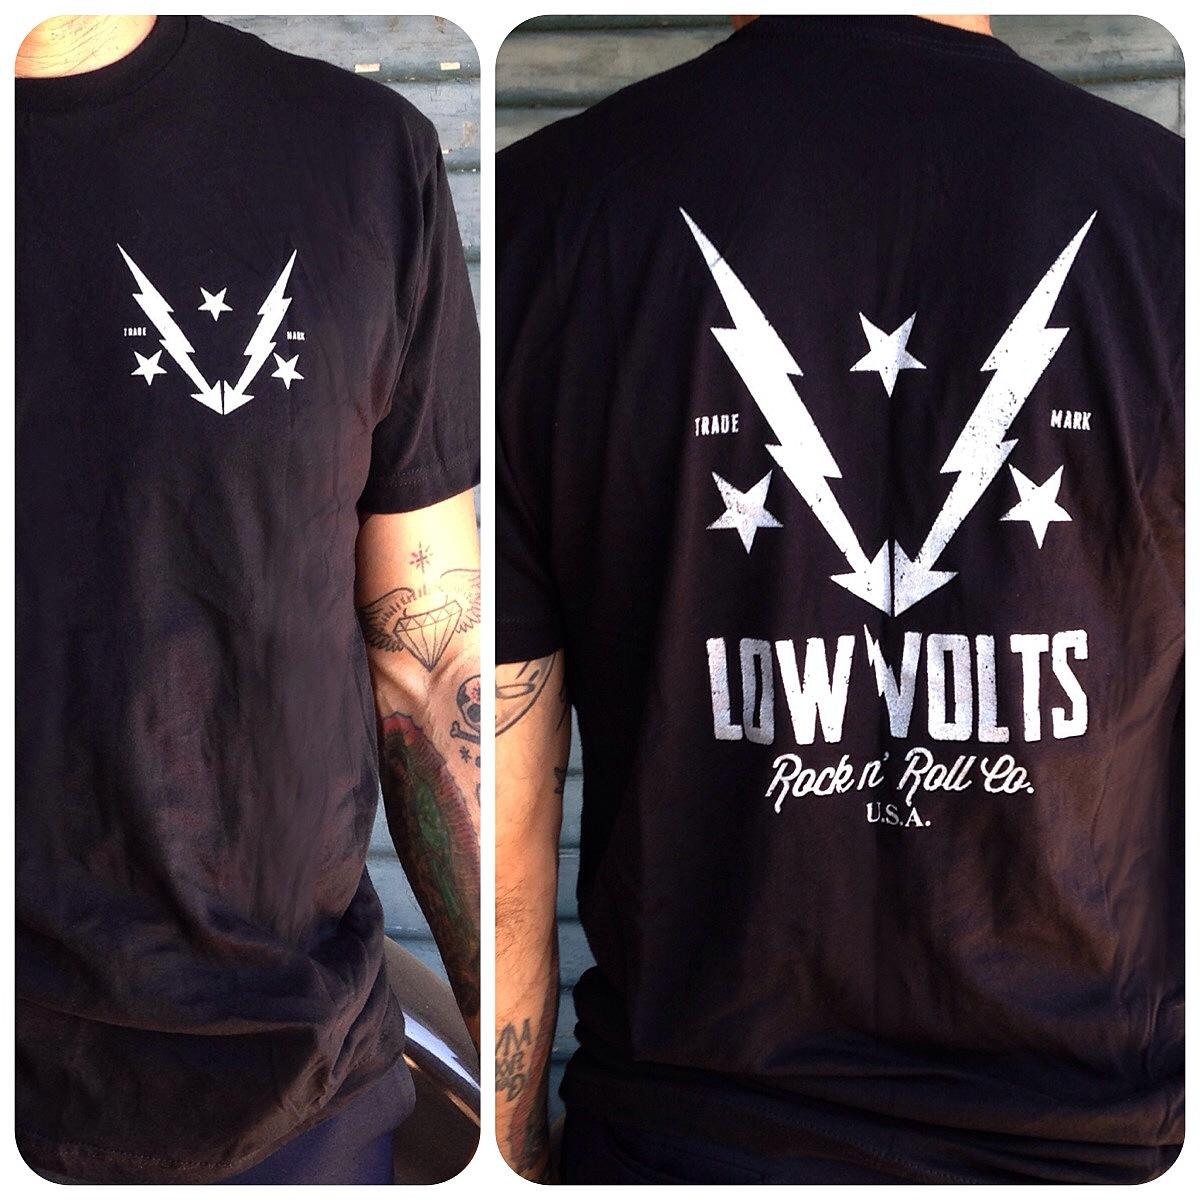 low-volts-r-n-r-shirt